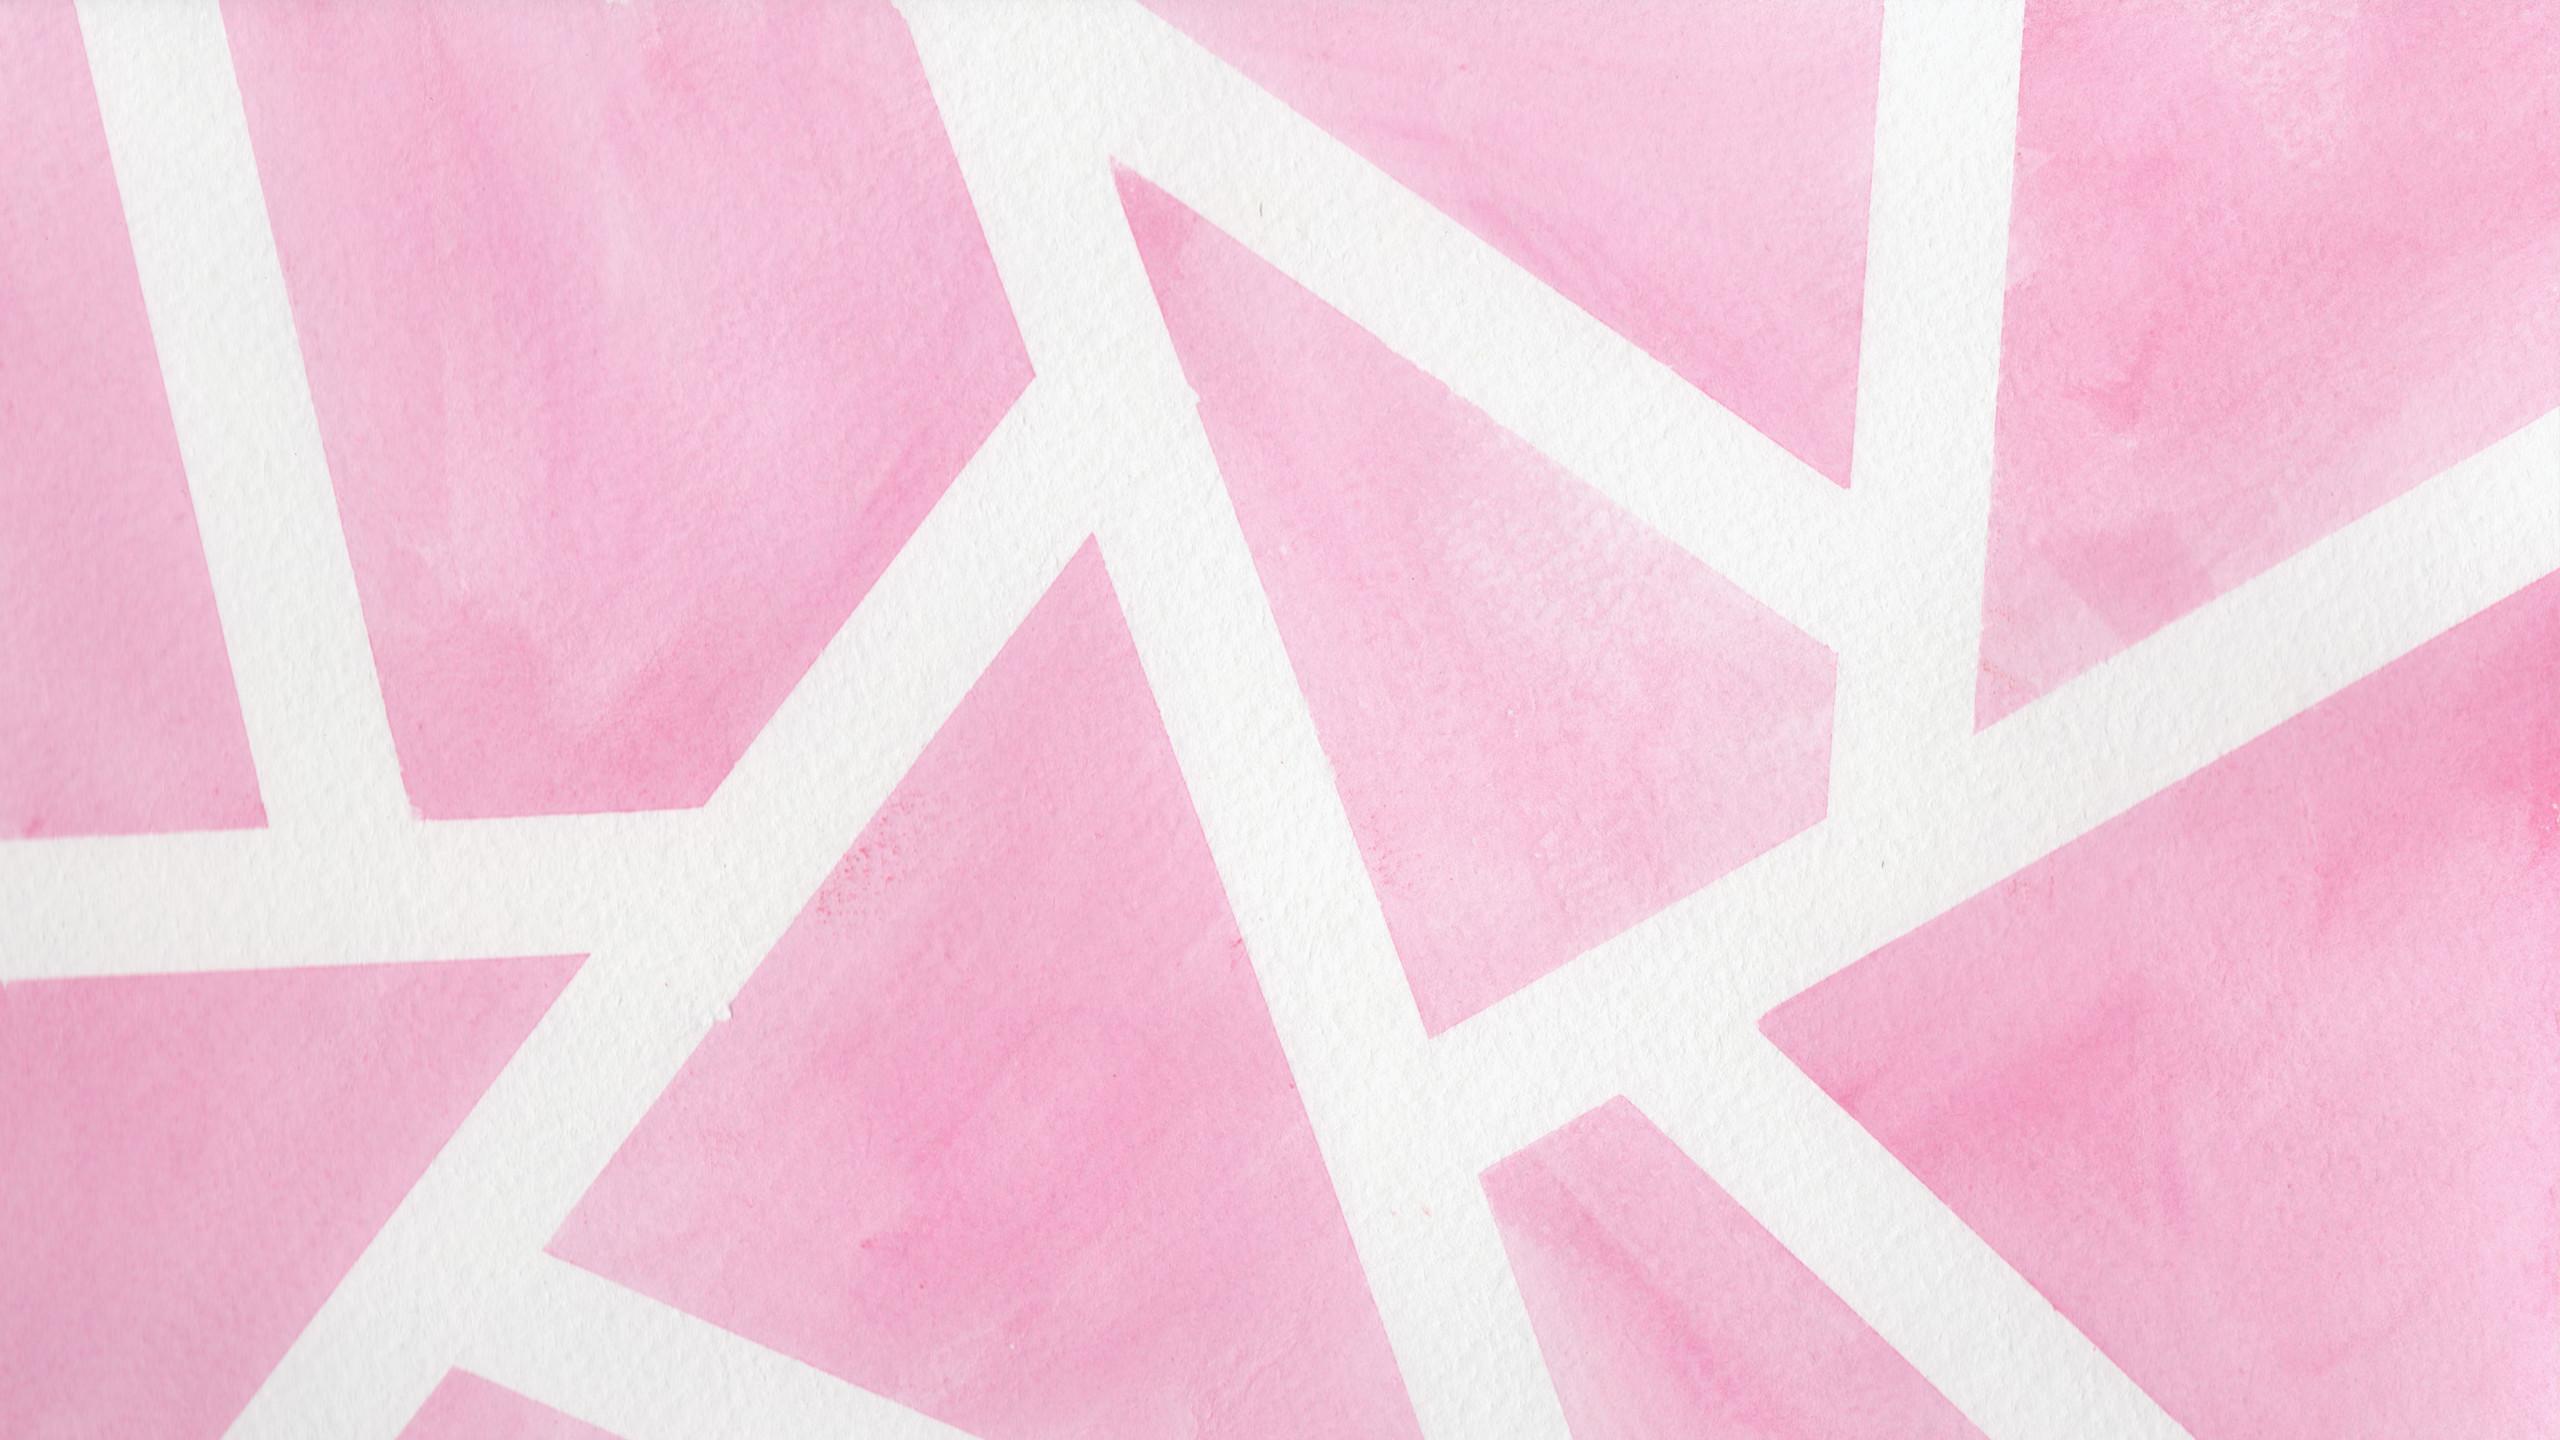 Light Pink Wallpaper Quotes Ombre Desktop Wallpaper 47 Images